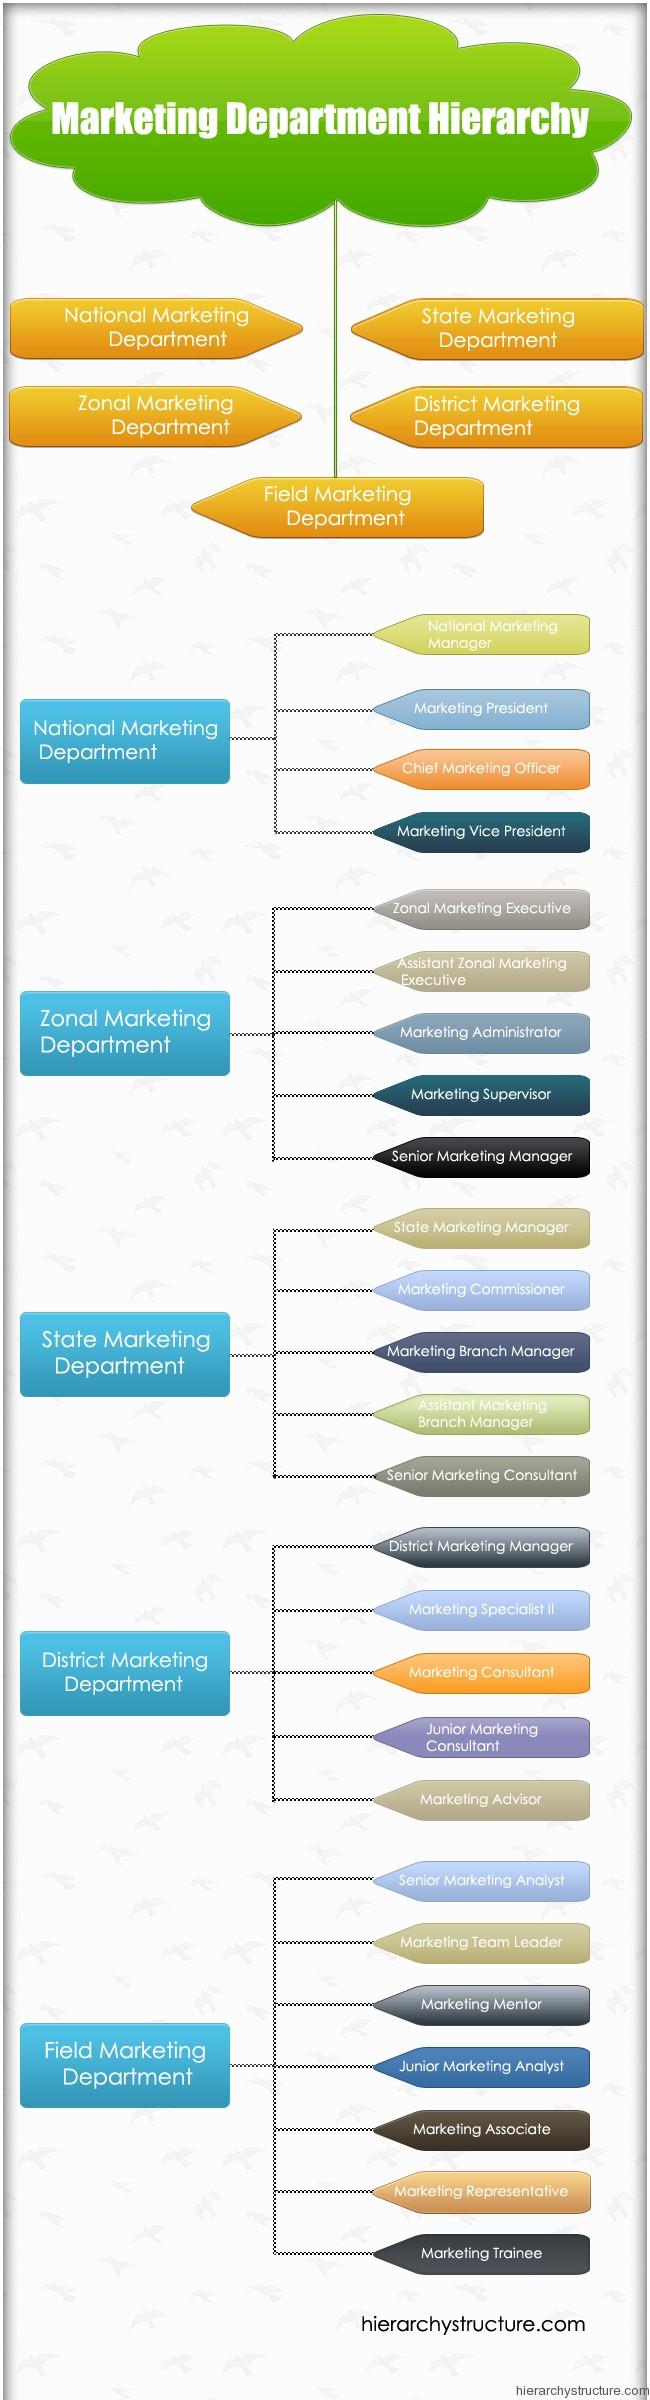 Marketing Department Hierarchy